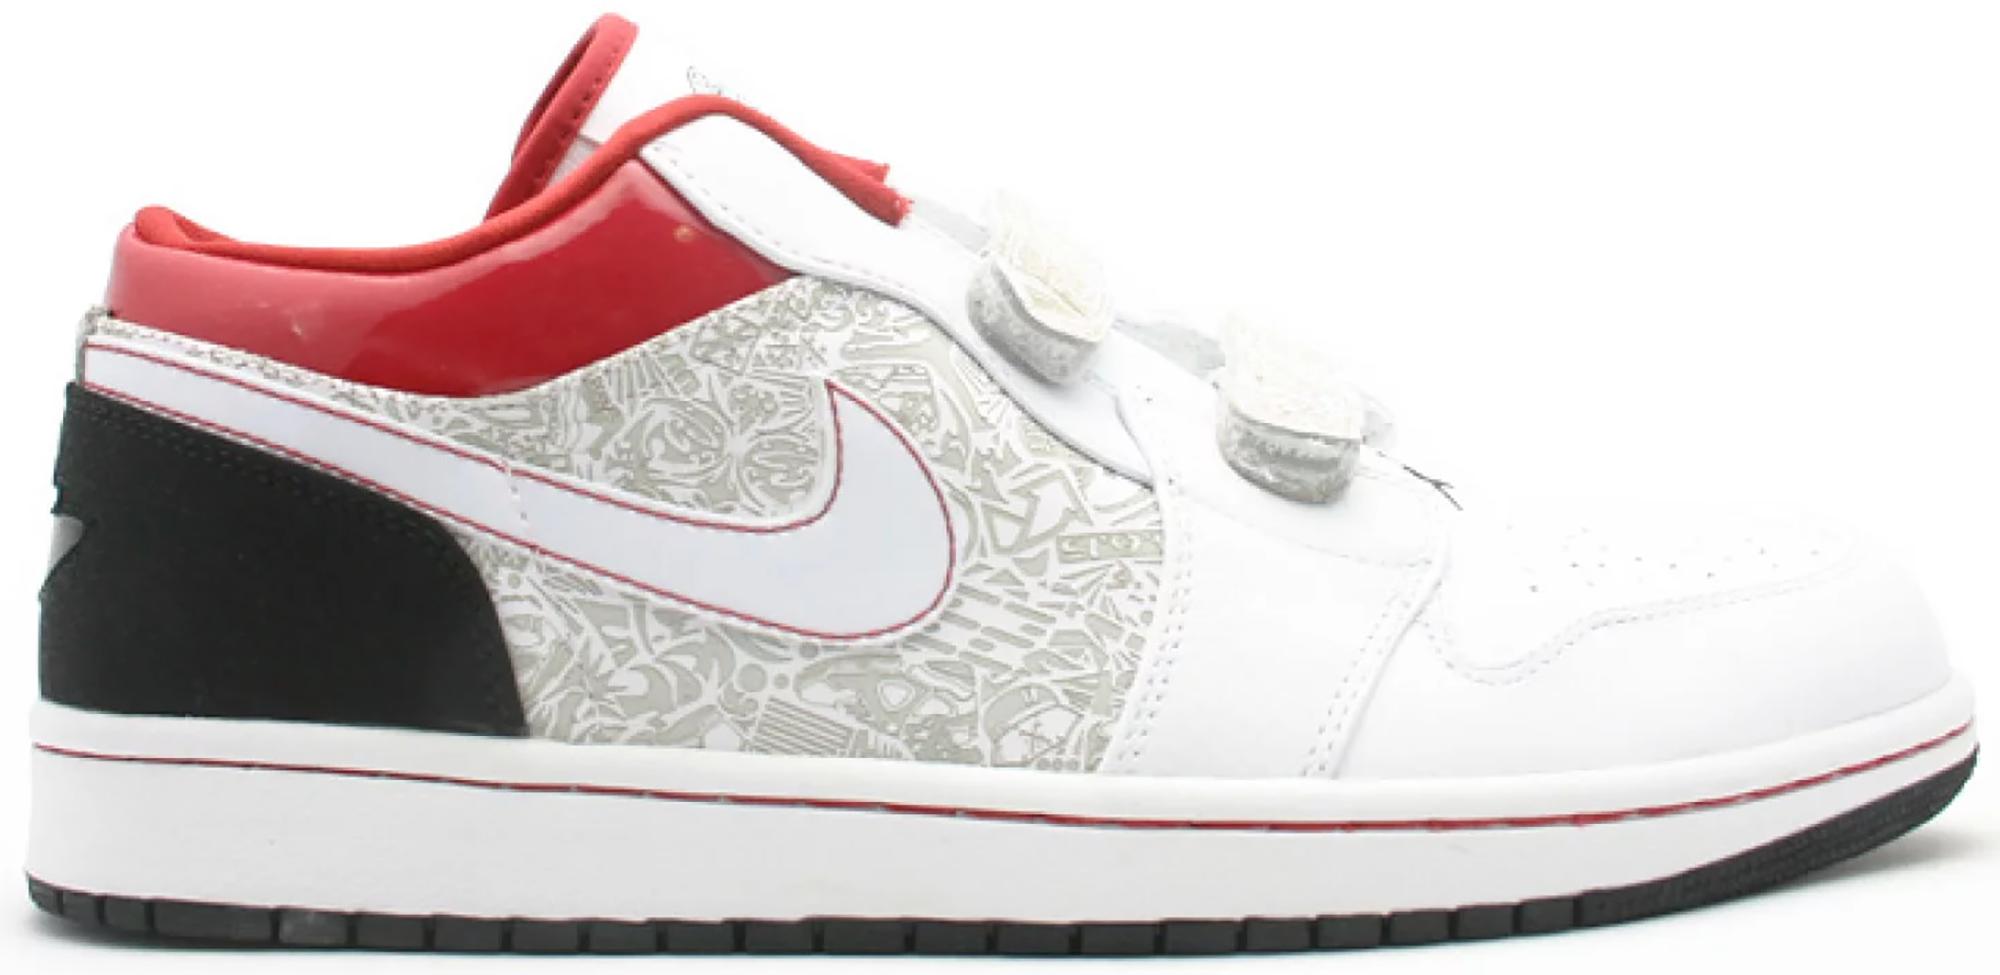 Jordan 1 Retro Low Velcro White Varsity